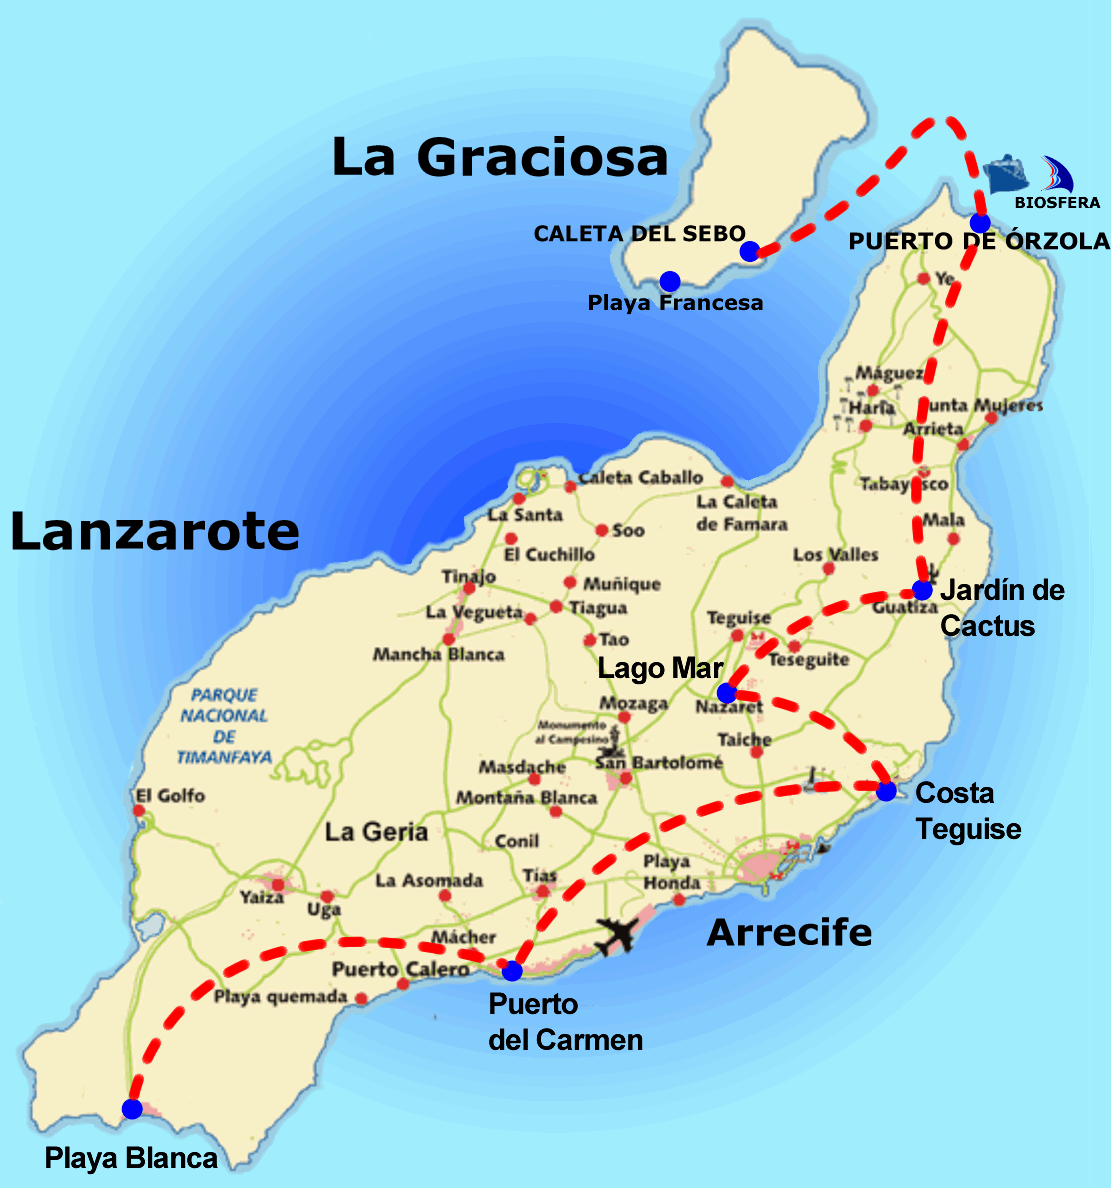 Map Of Spain Lanzarote.Map That Shows Lanzarote And La Graciosa Island Canary Islands